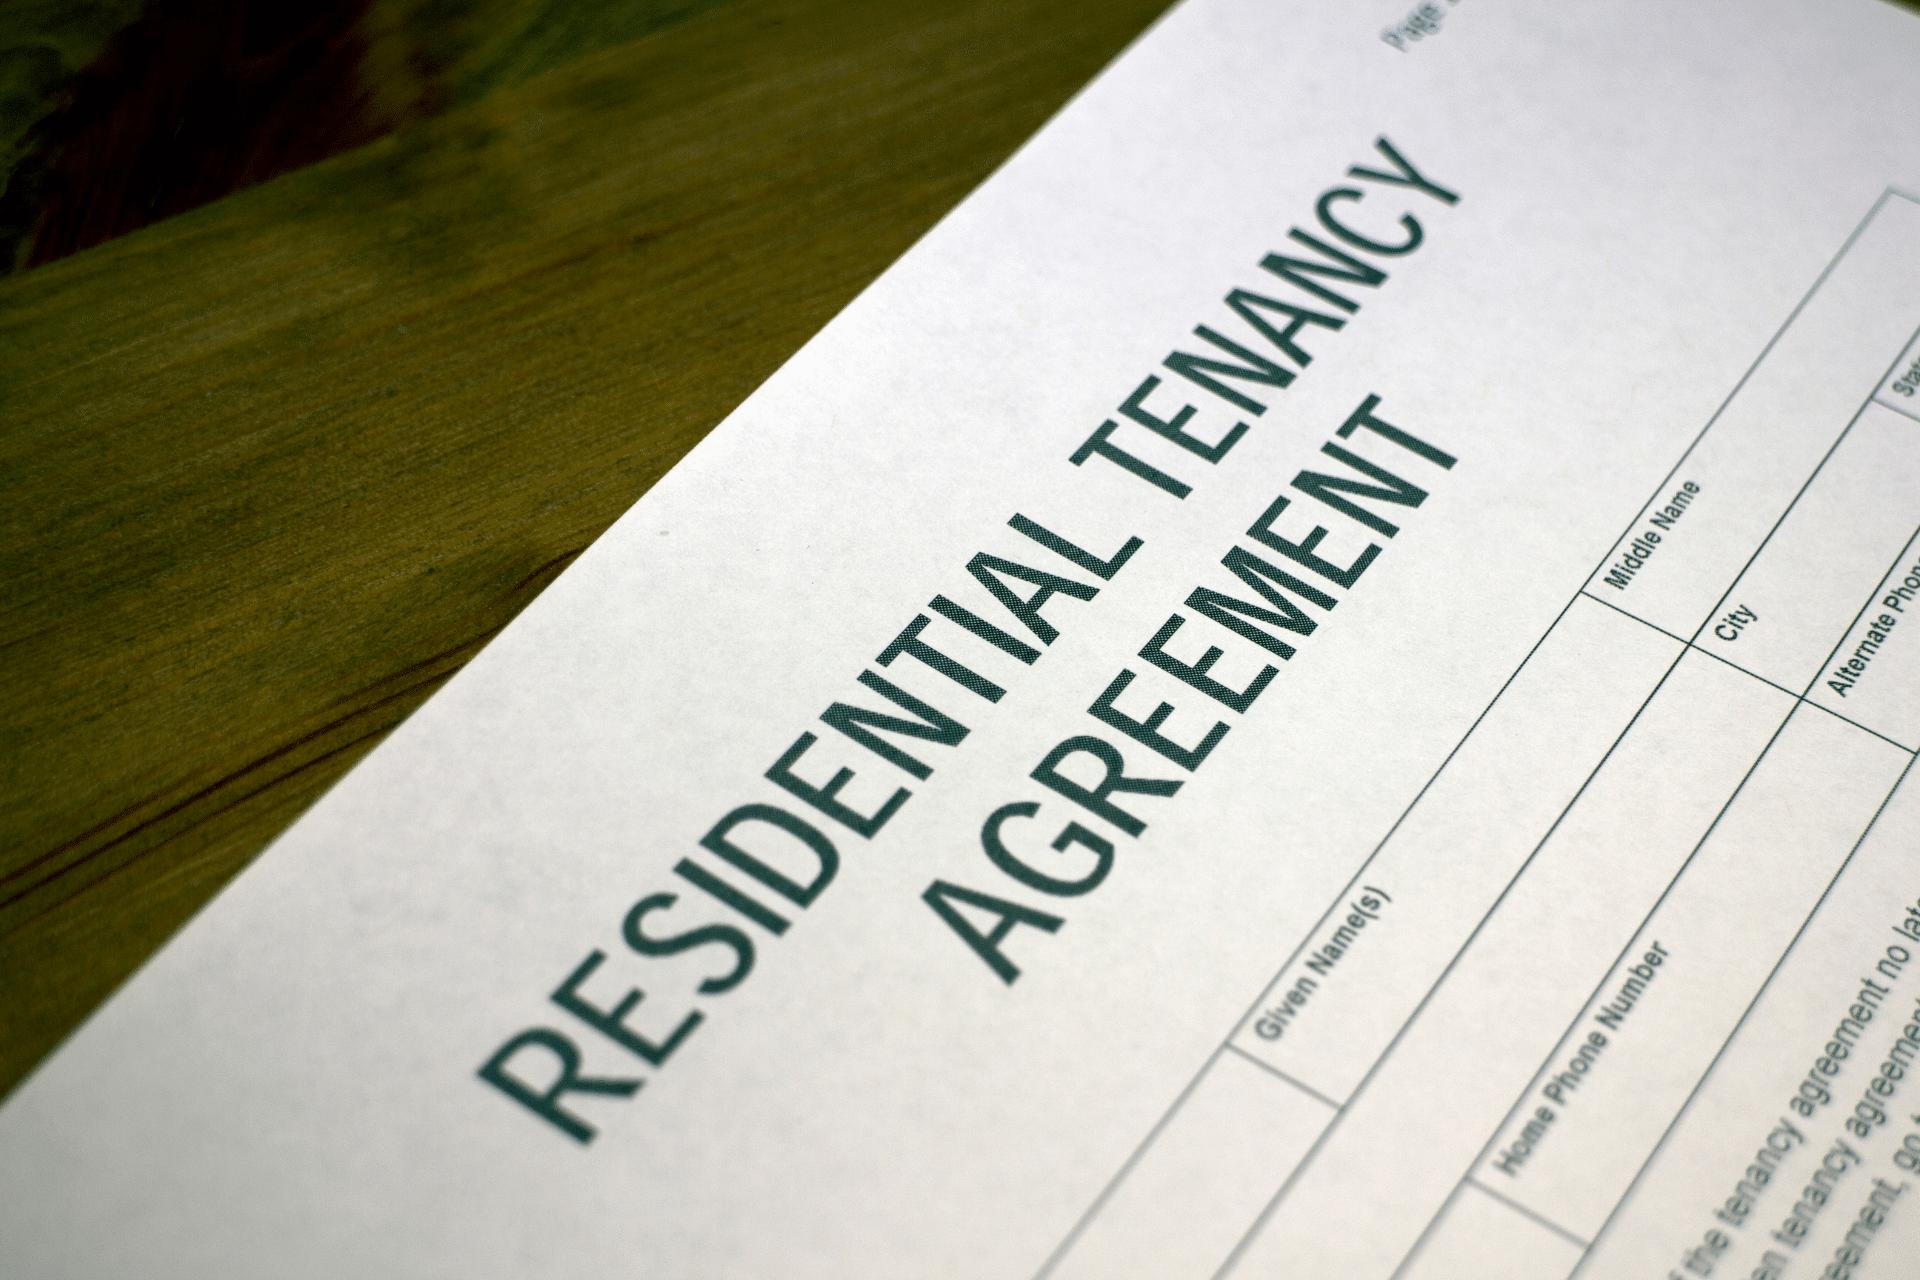 residential tenant agreement paperwork